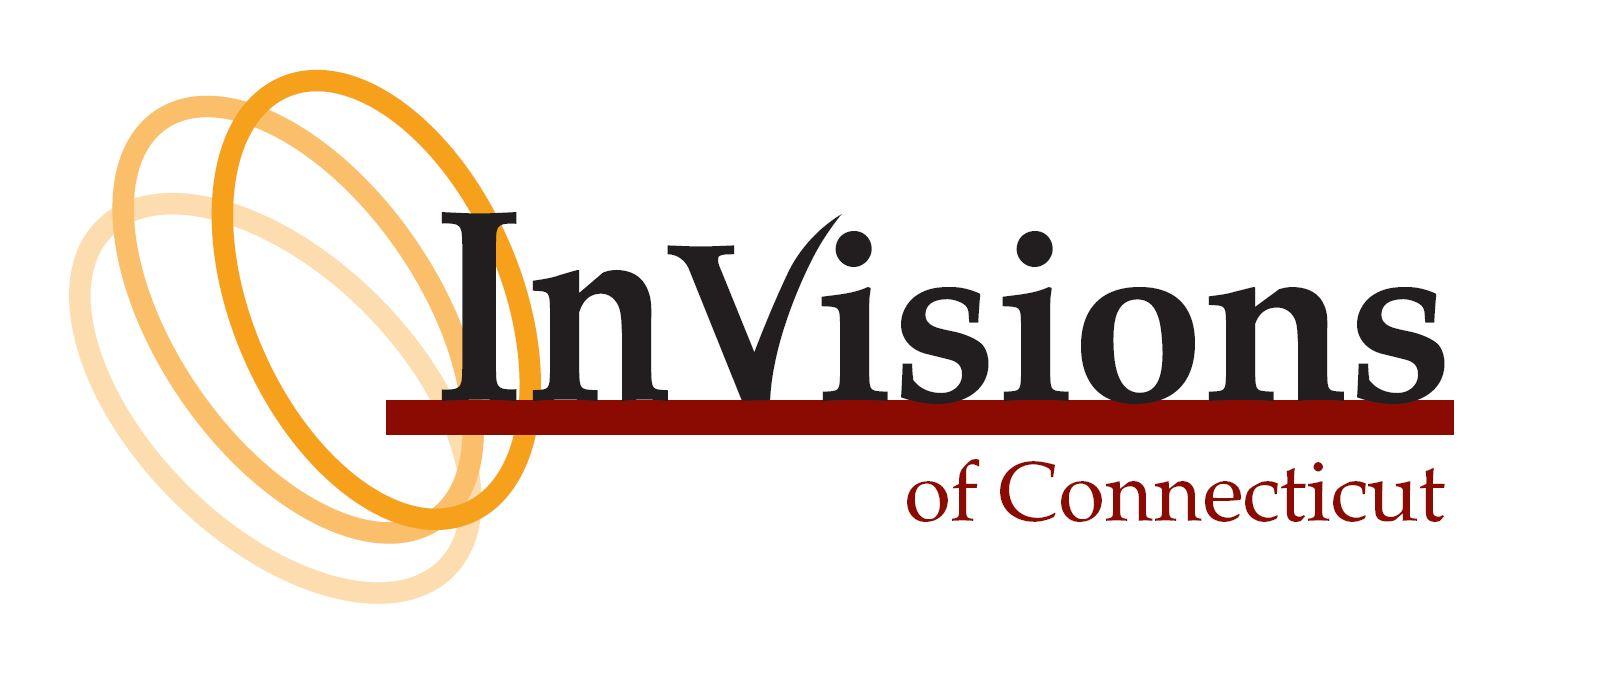 Invisions logo.JPG